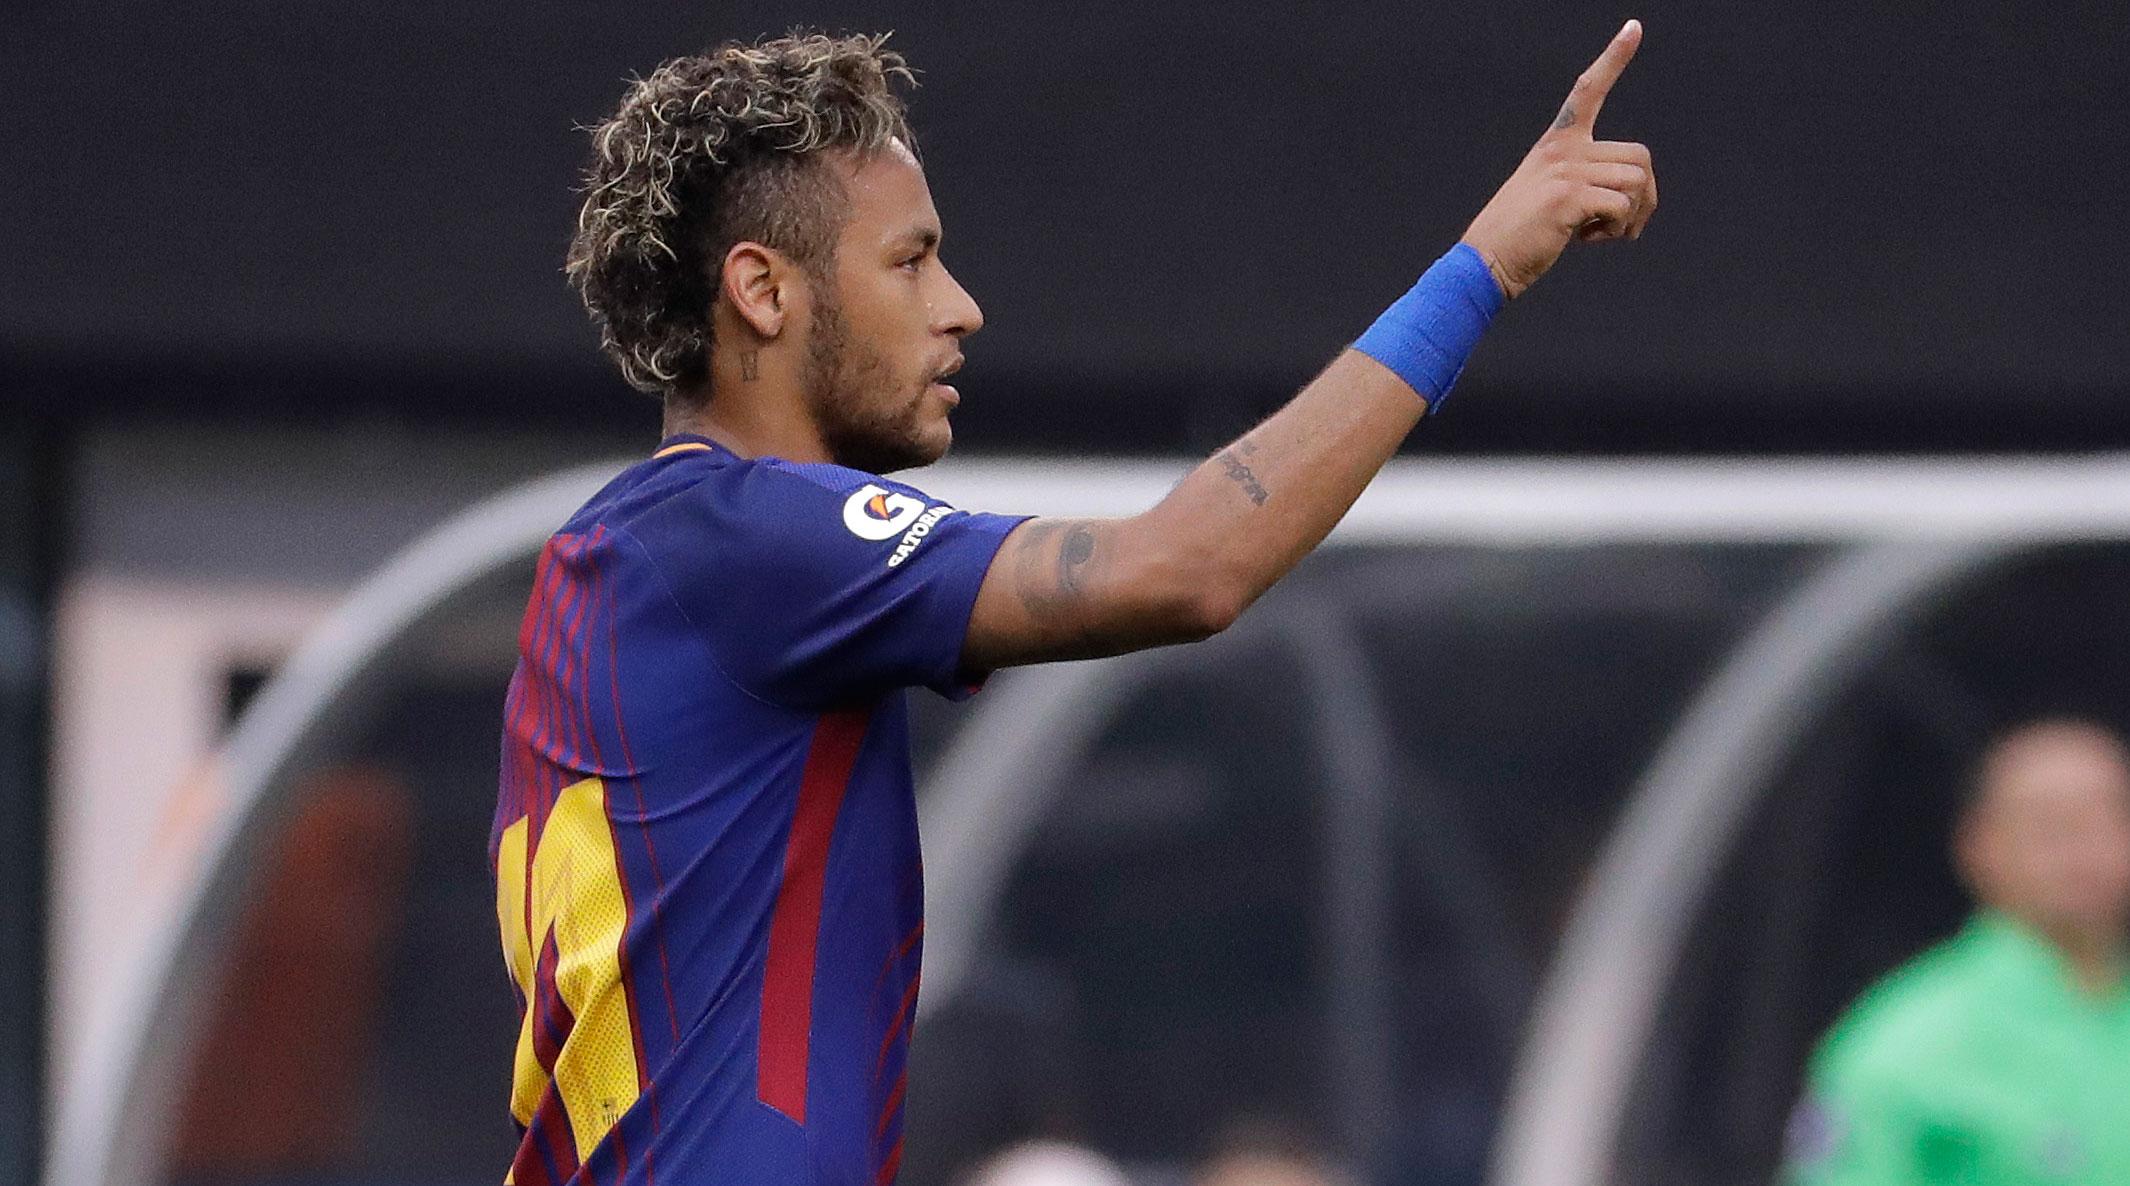 Watch: Neymar Embarrasses Juventus Defense, Scores Absurd Goal for Barcelona